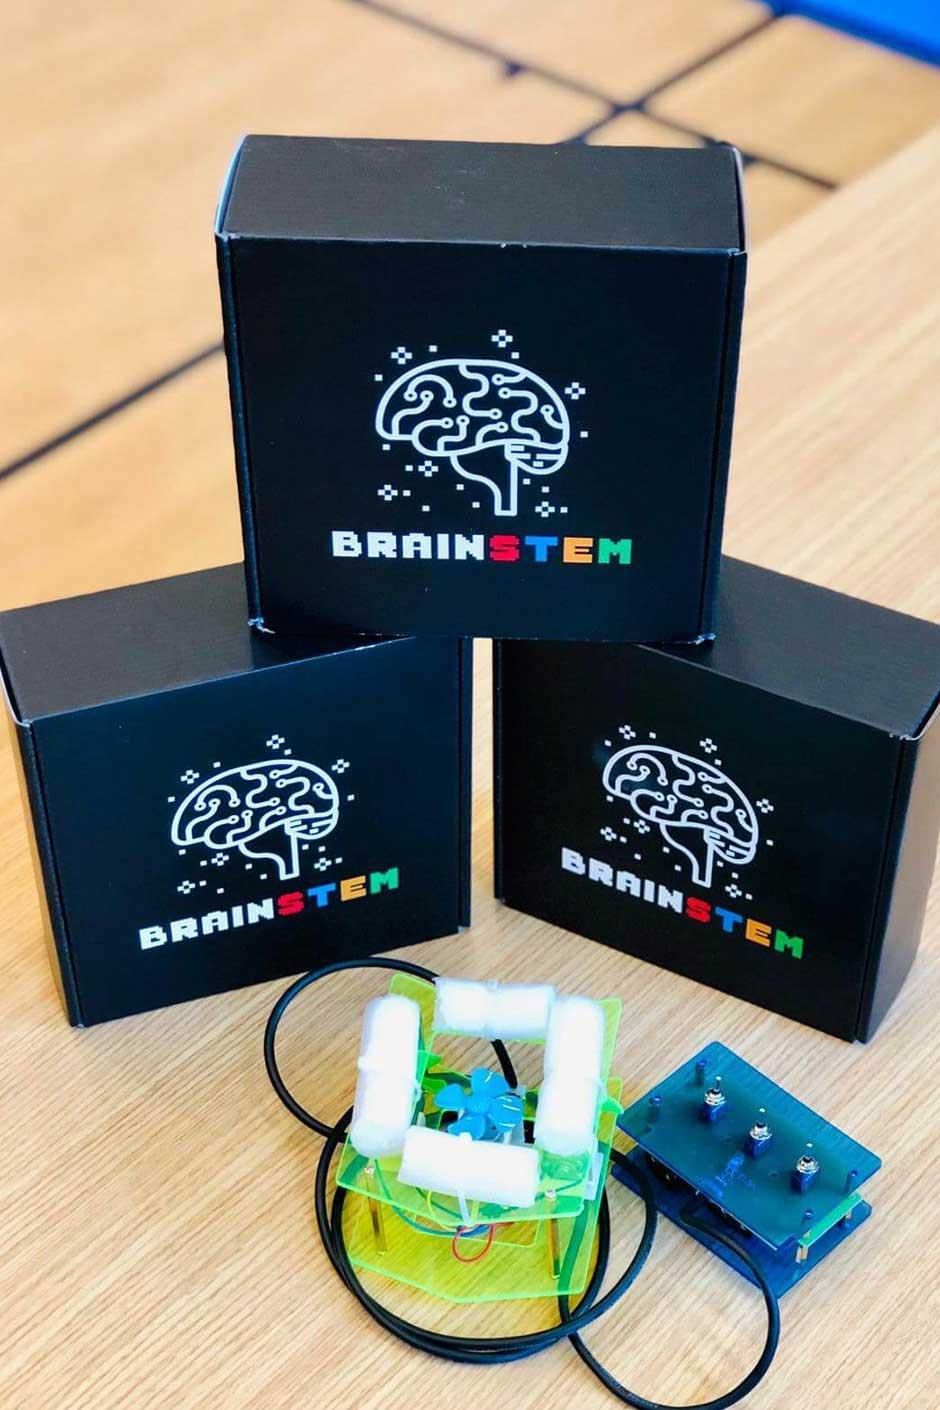 BrainSTEM Custom Packaging Robotics Kit